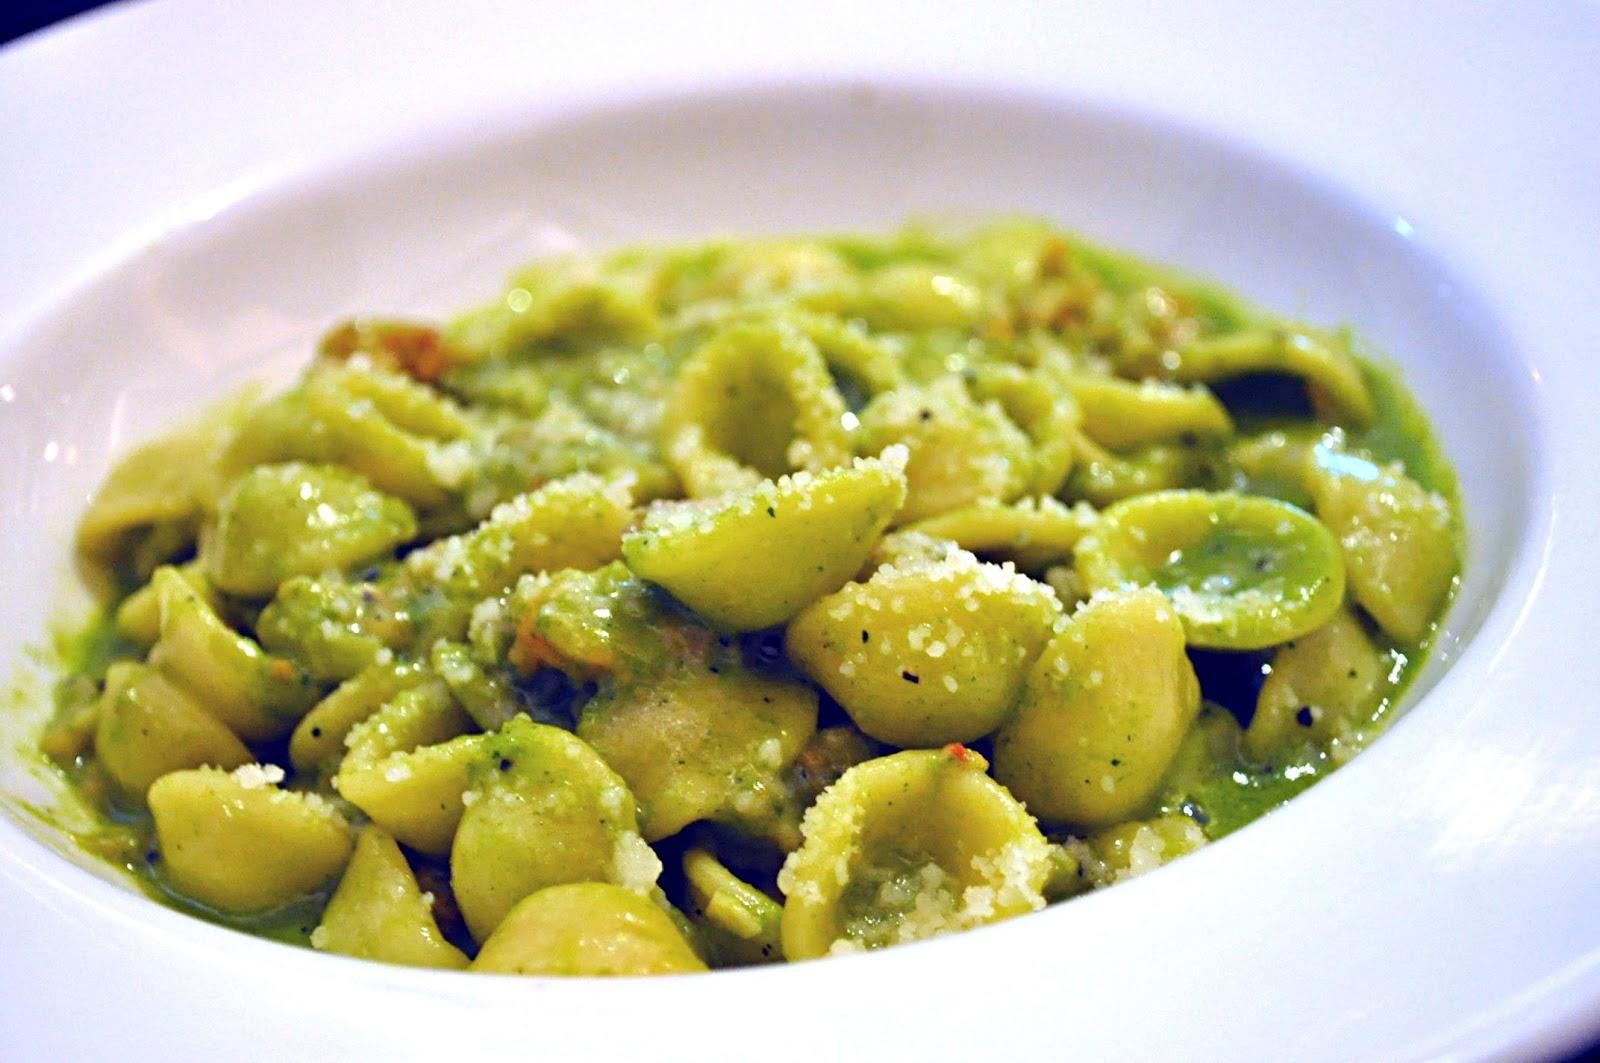 Orecchiette served with Chopped Sea Prawn in Zucchini and Garlic Cream